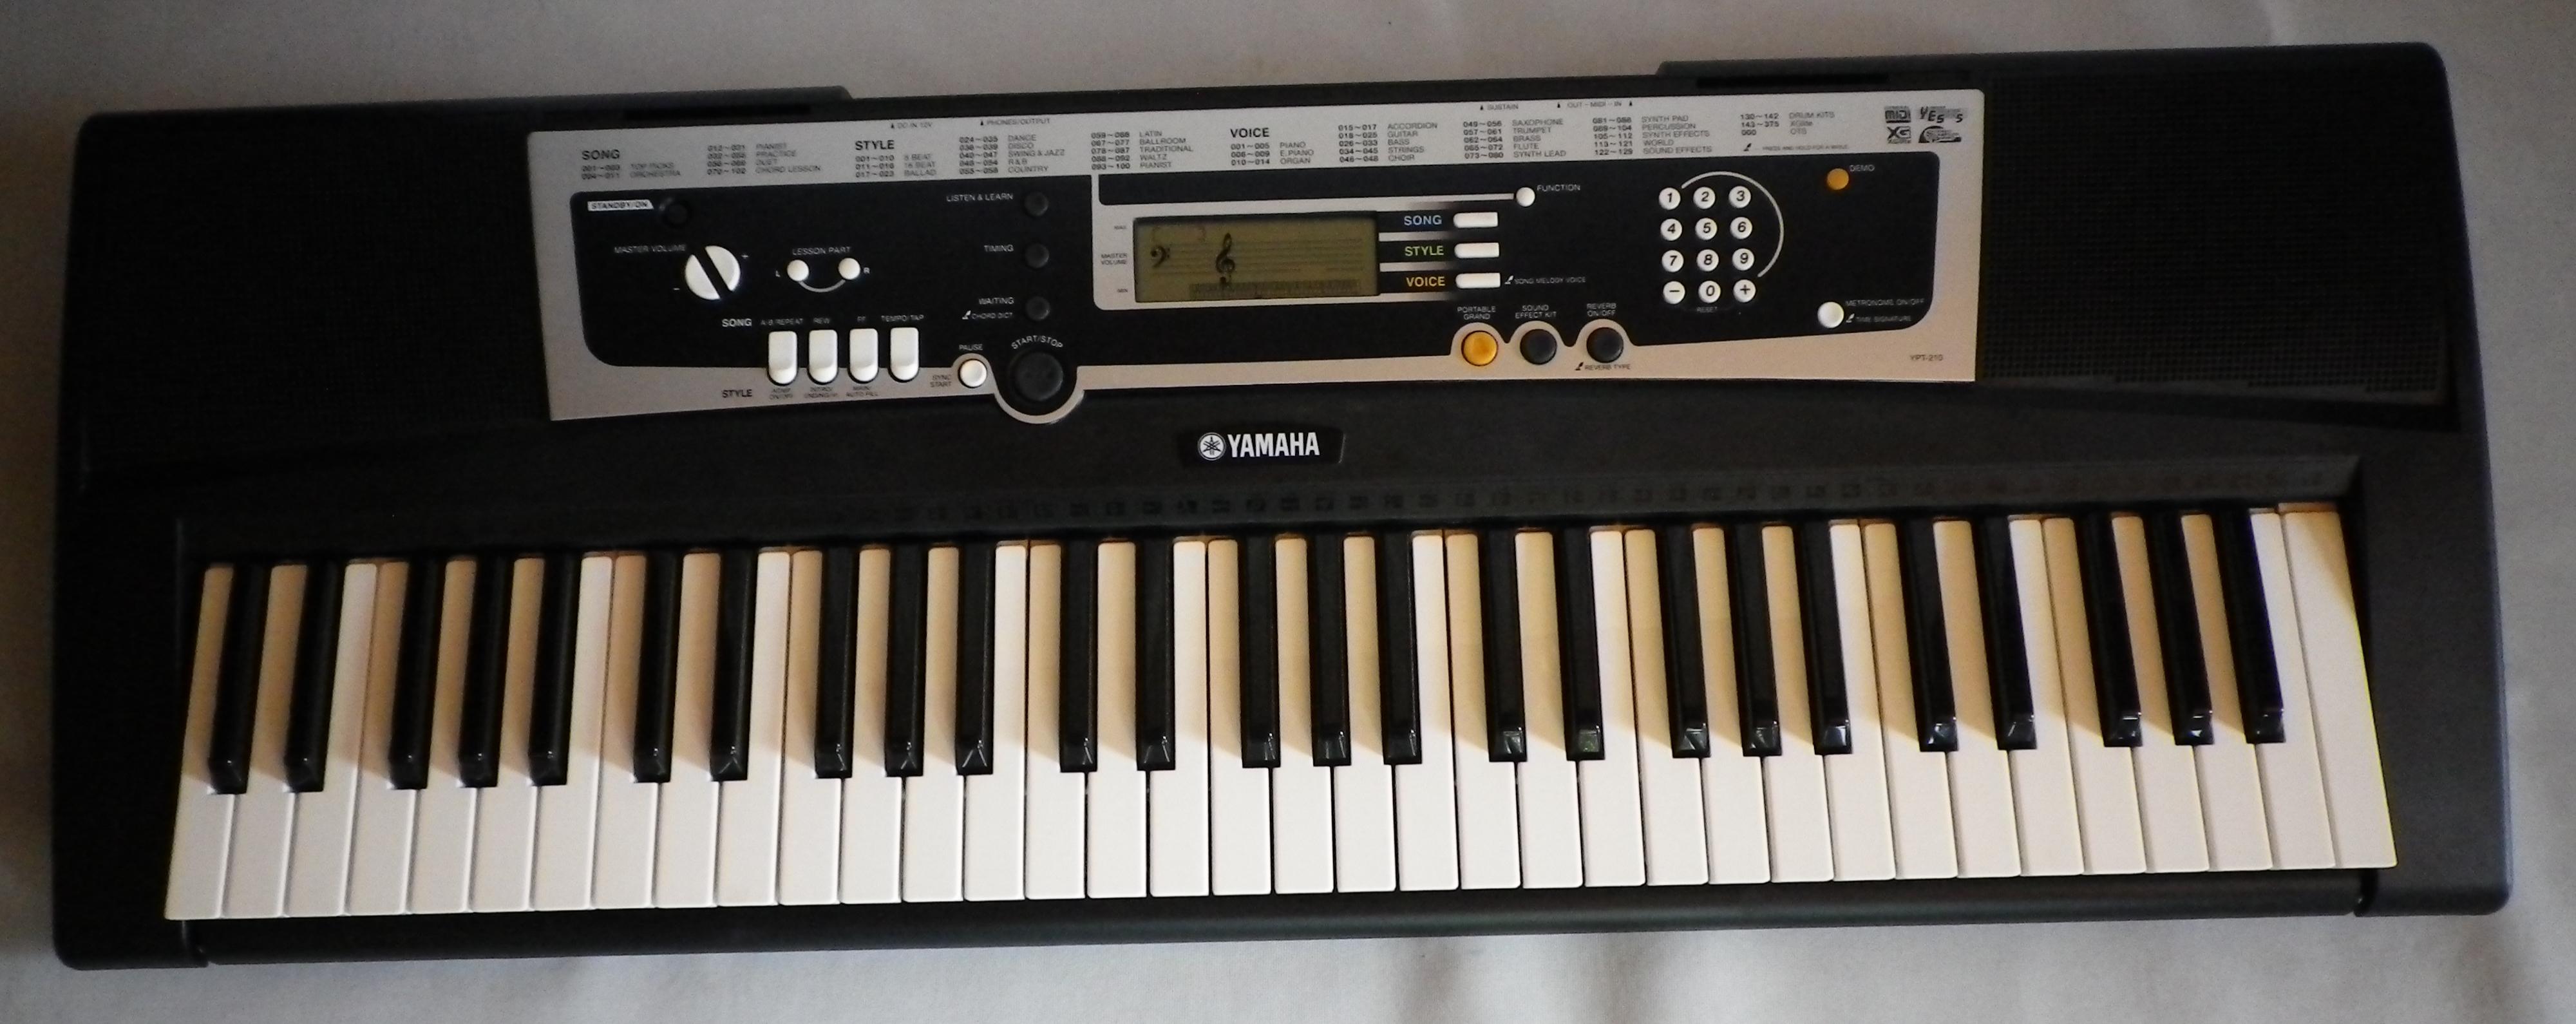 Yamaha Ypt Keyboard Price